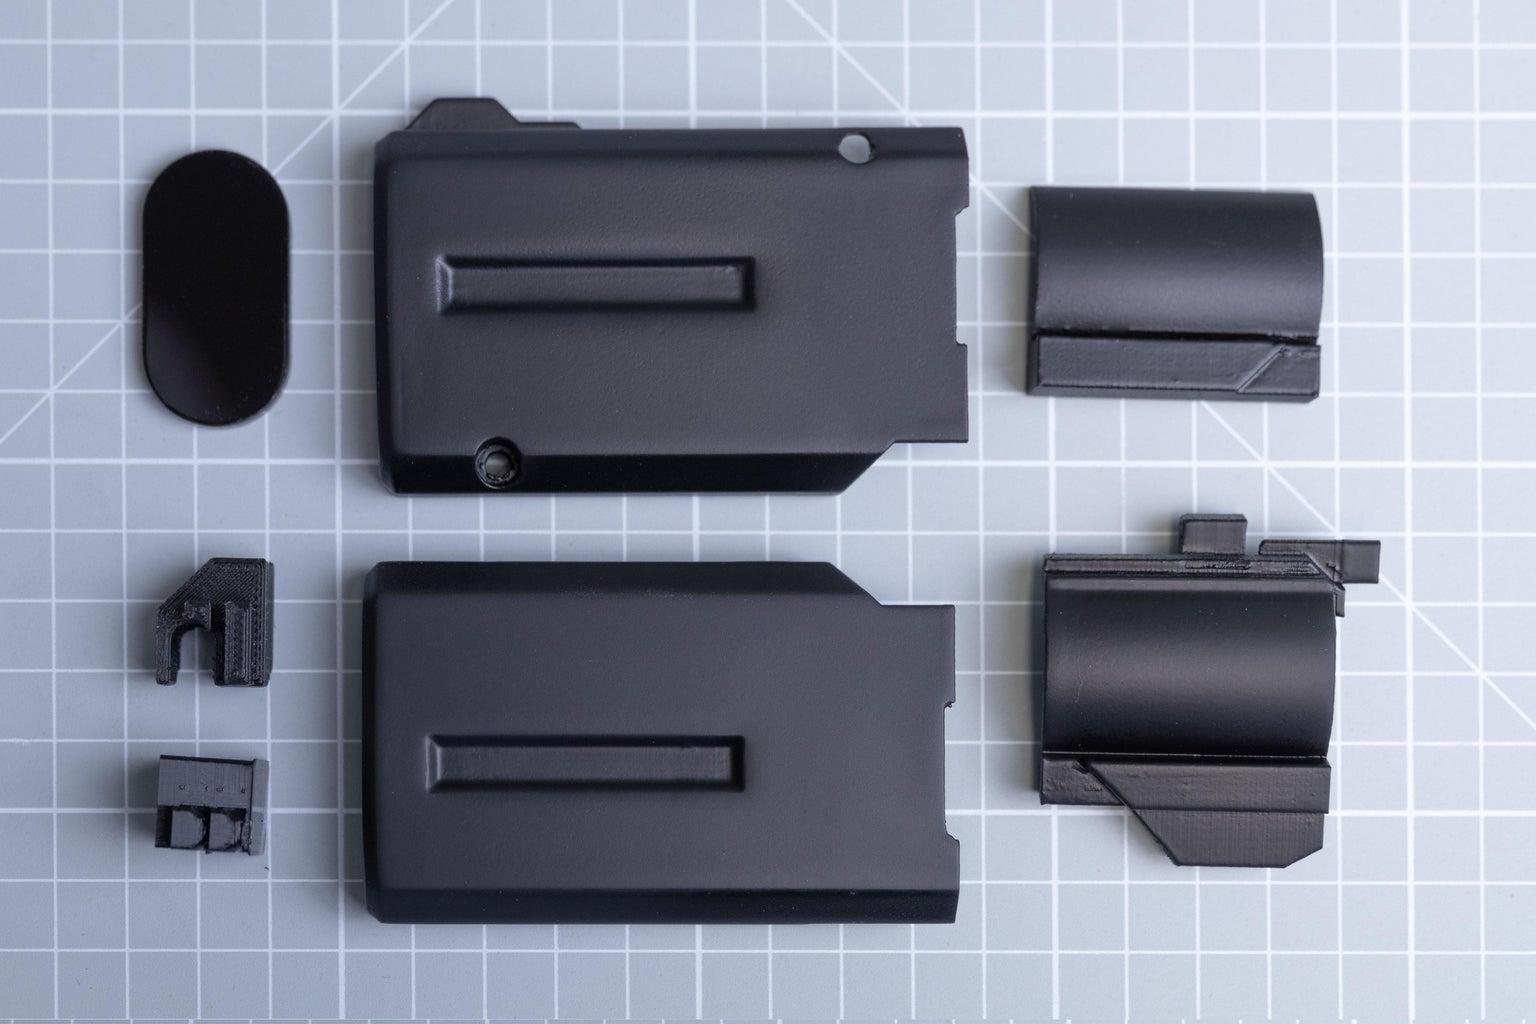 3D Printing + Laser Cutting